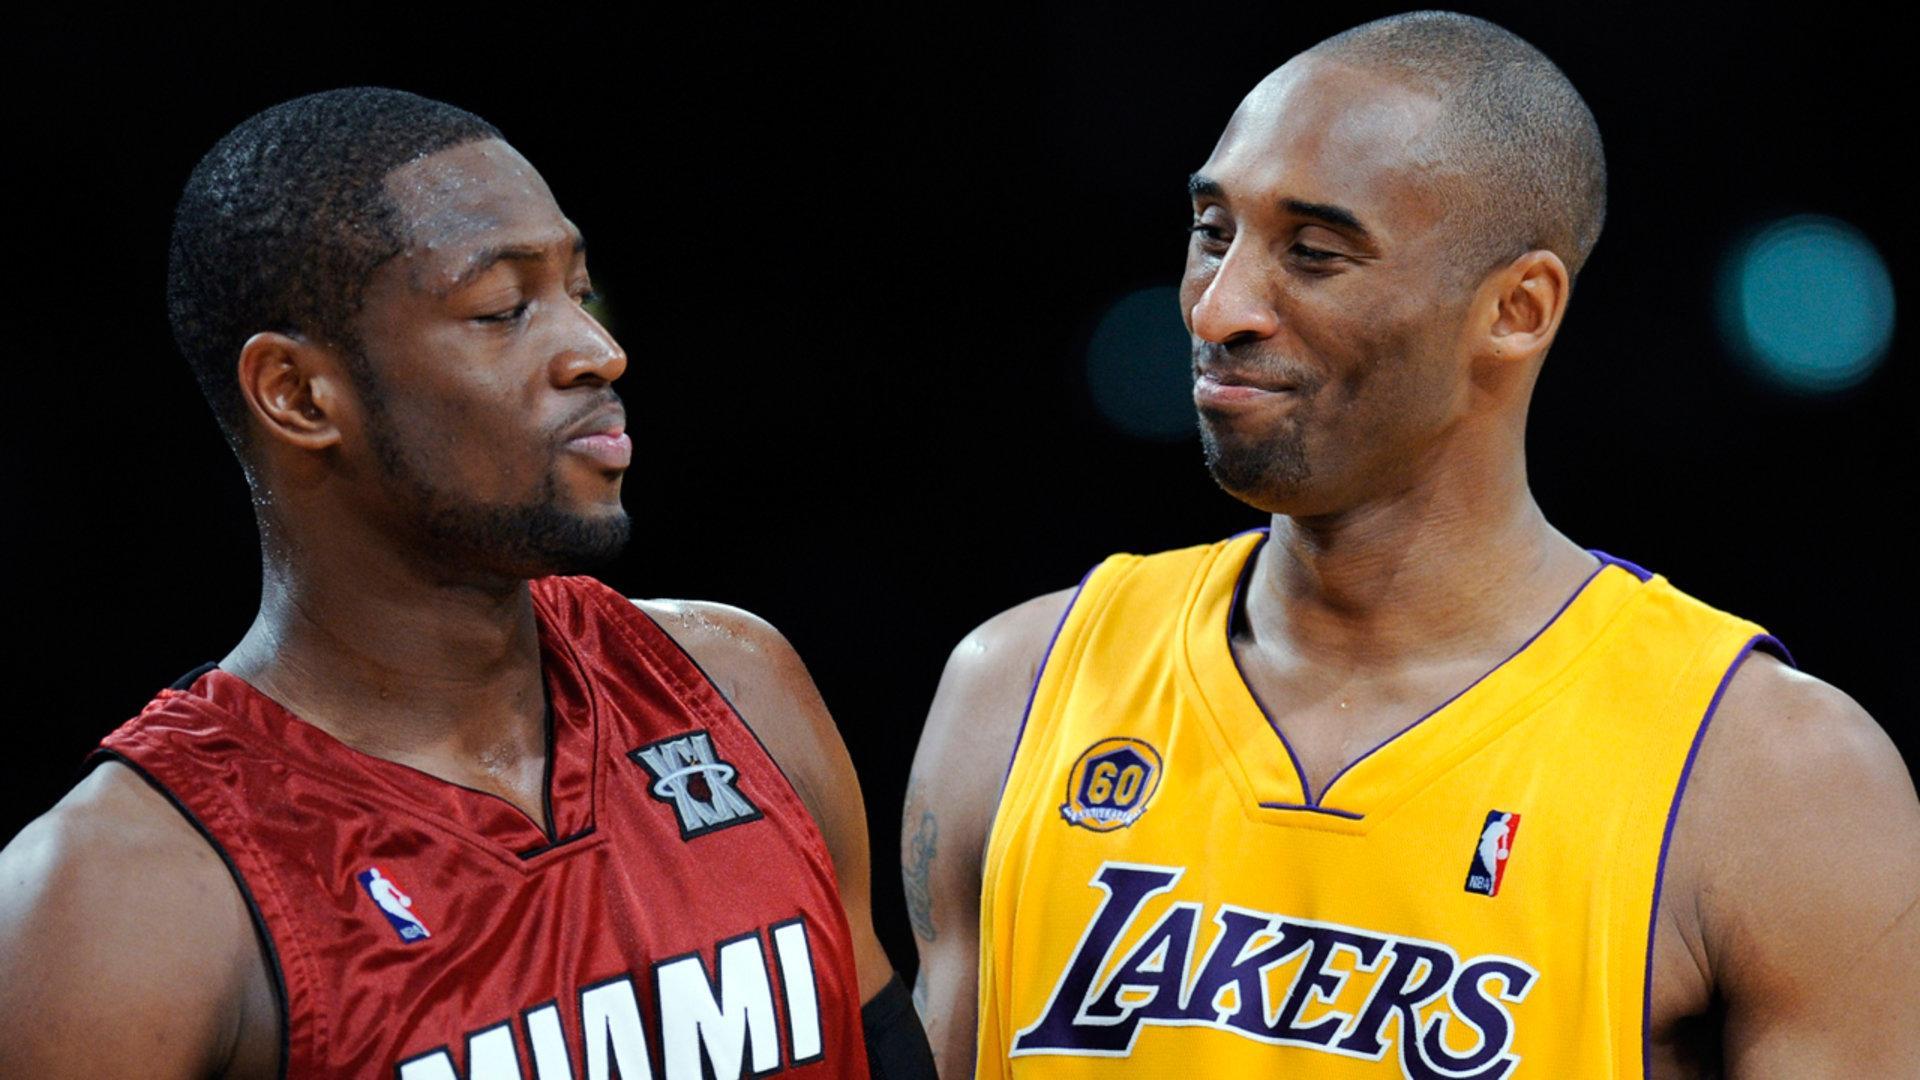 Dwyane Wade Reveals Where He Ranks Kobe on the All-Time Shooting Guard List